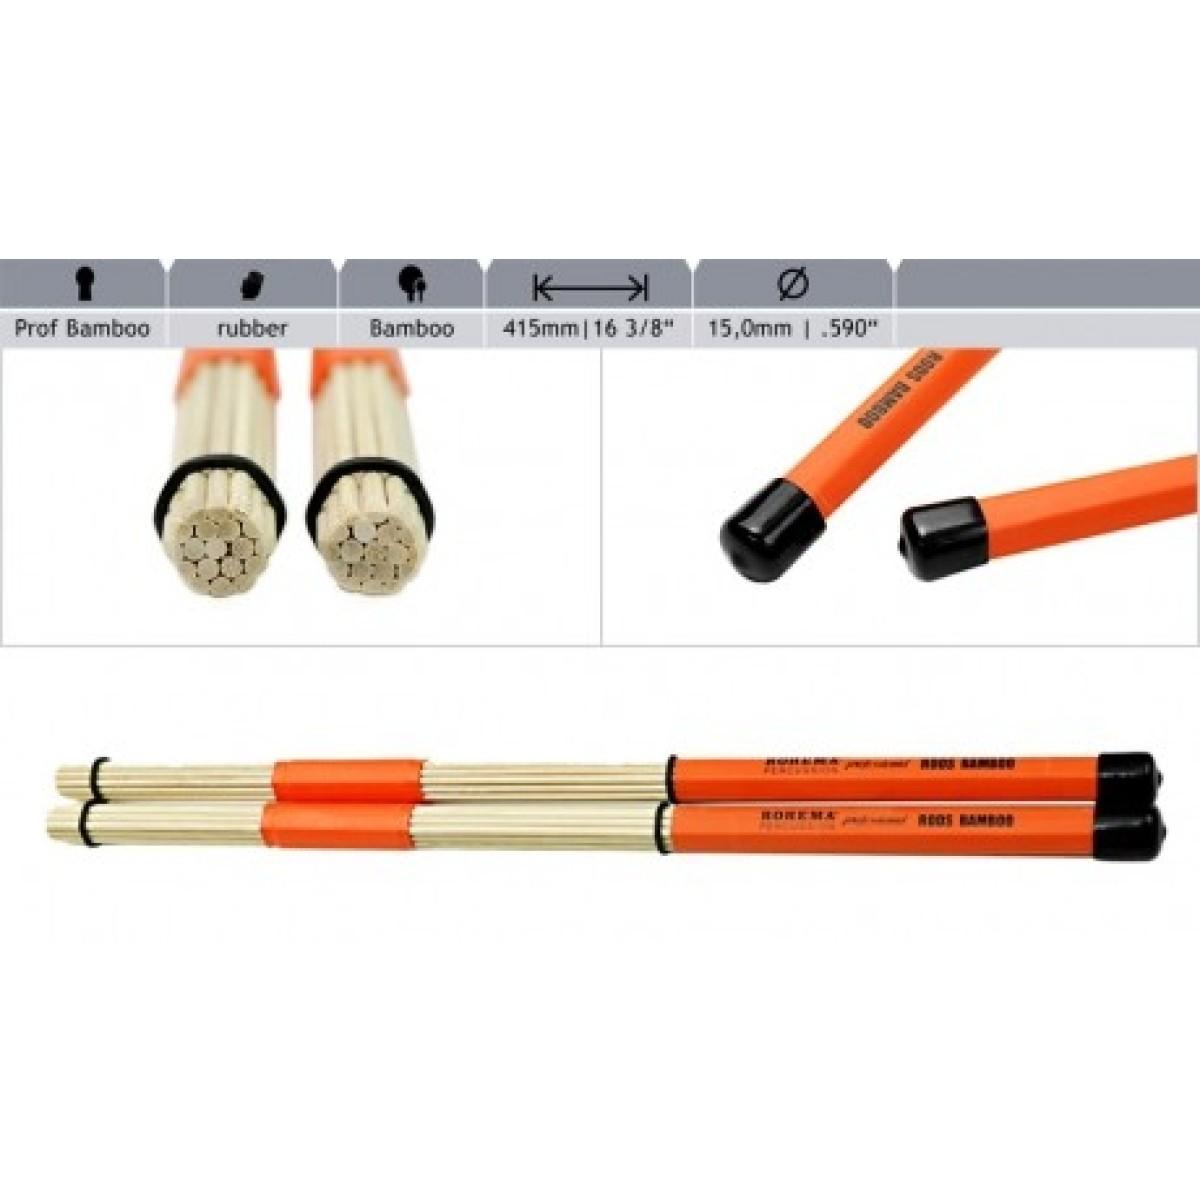 Rohema Professional Hot Rods (Bamboo)